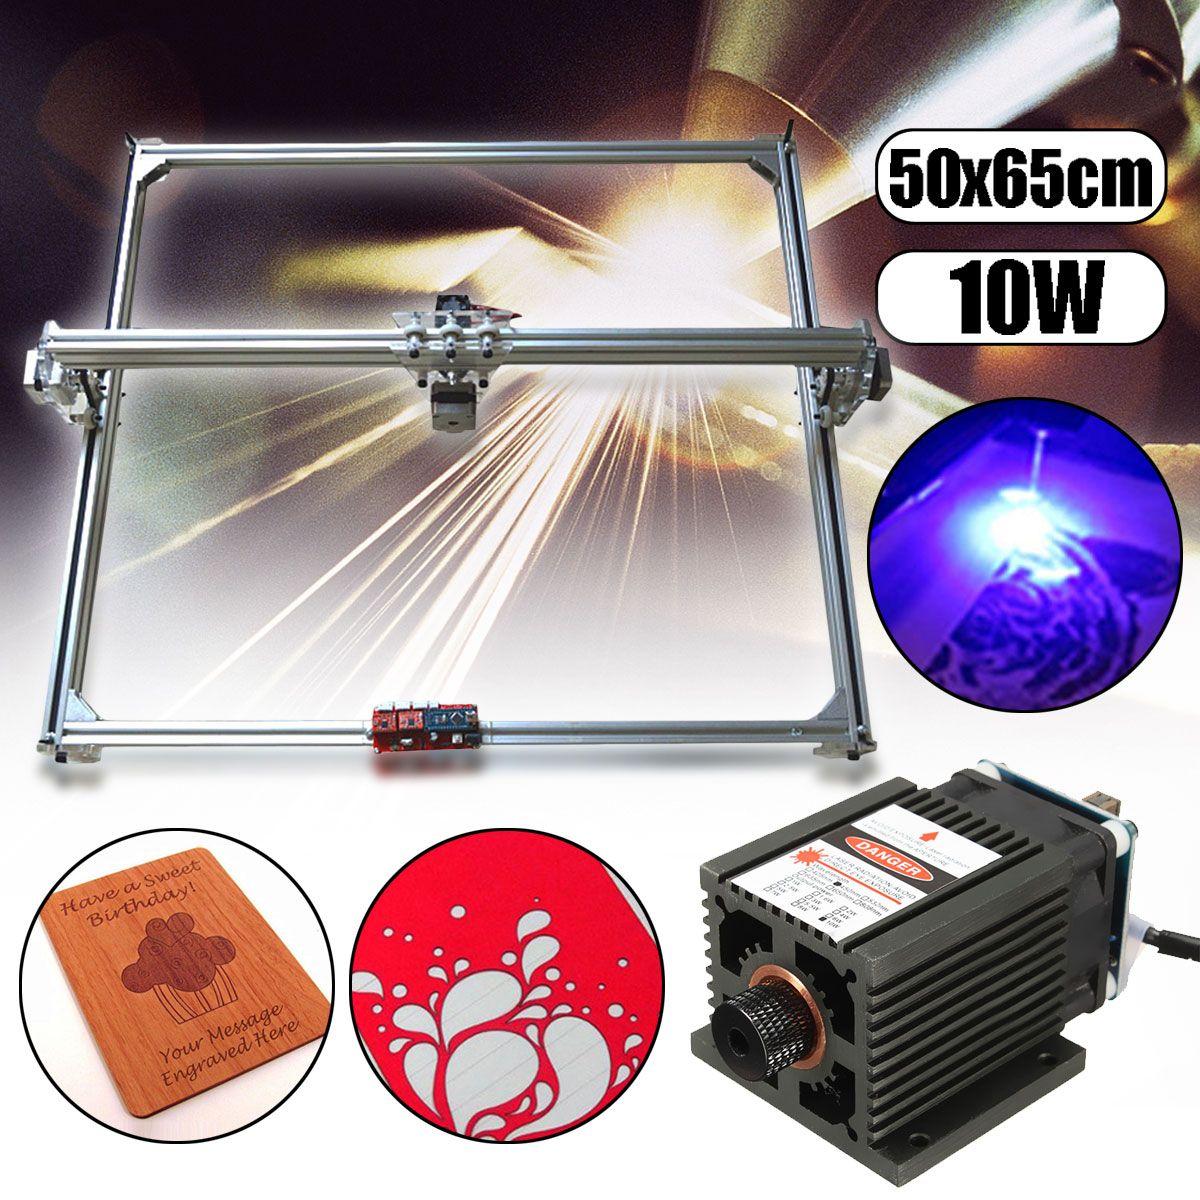 50*65cm Area Mini Laser Engraving Cutting Machine Printer DC 12V Wood Cutter + 10W Blue Laser Head Power Adjust DIY Desktop Kit